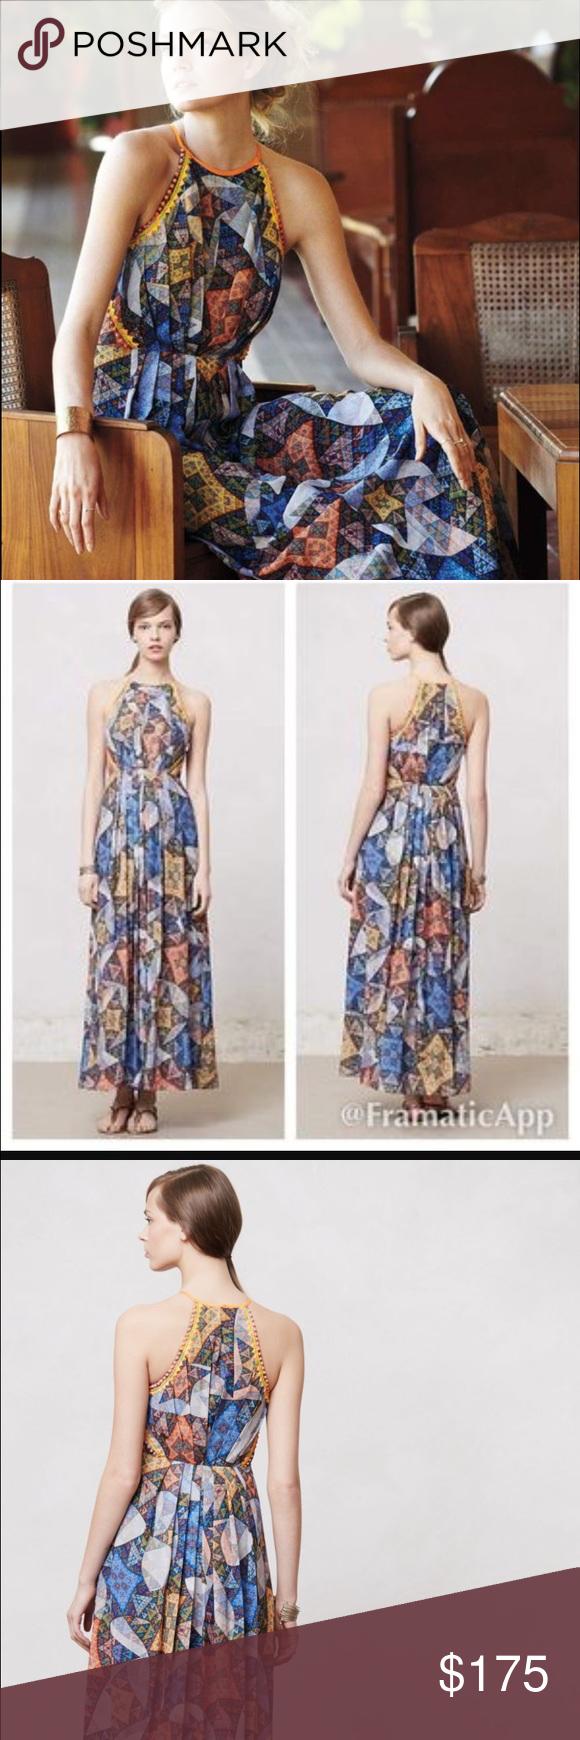 406d38968052 Ranna Gill Condesa maxi dress Ranna Gill Condesa maxi dress. Size small.  Excellent condition. Anthropologie Dresses Maxi